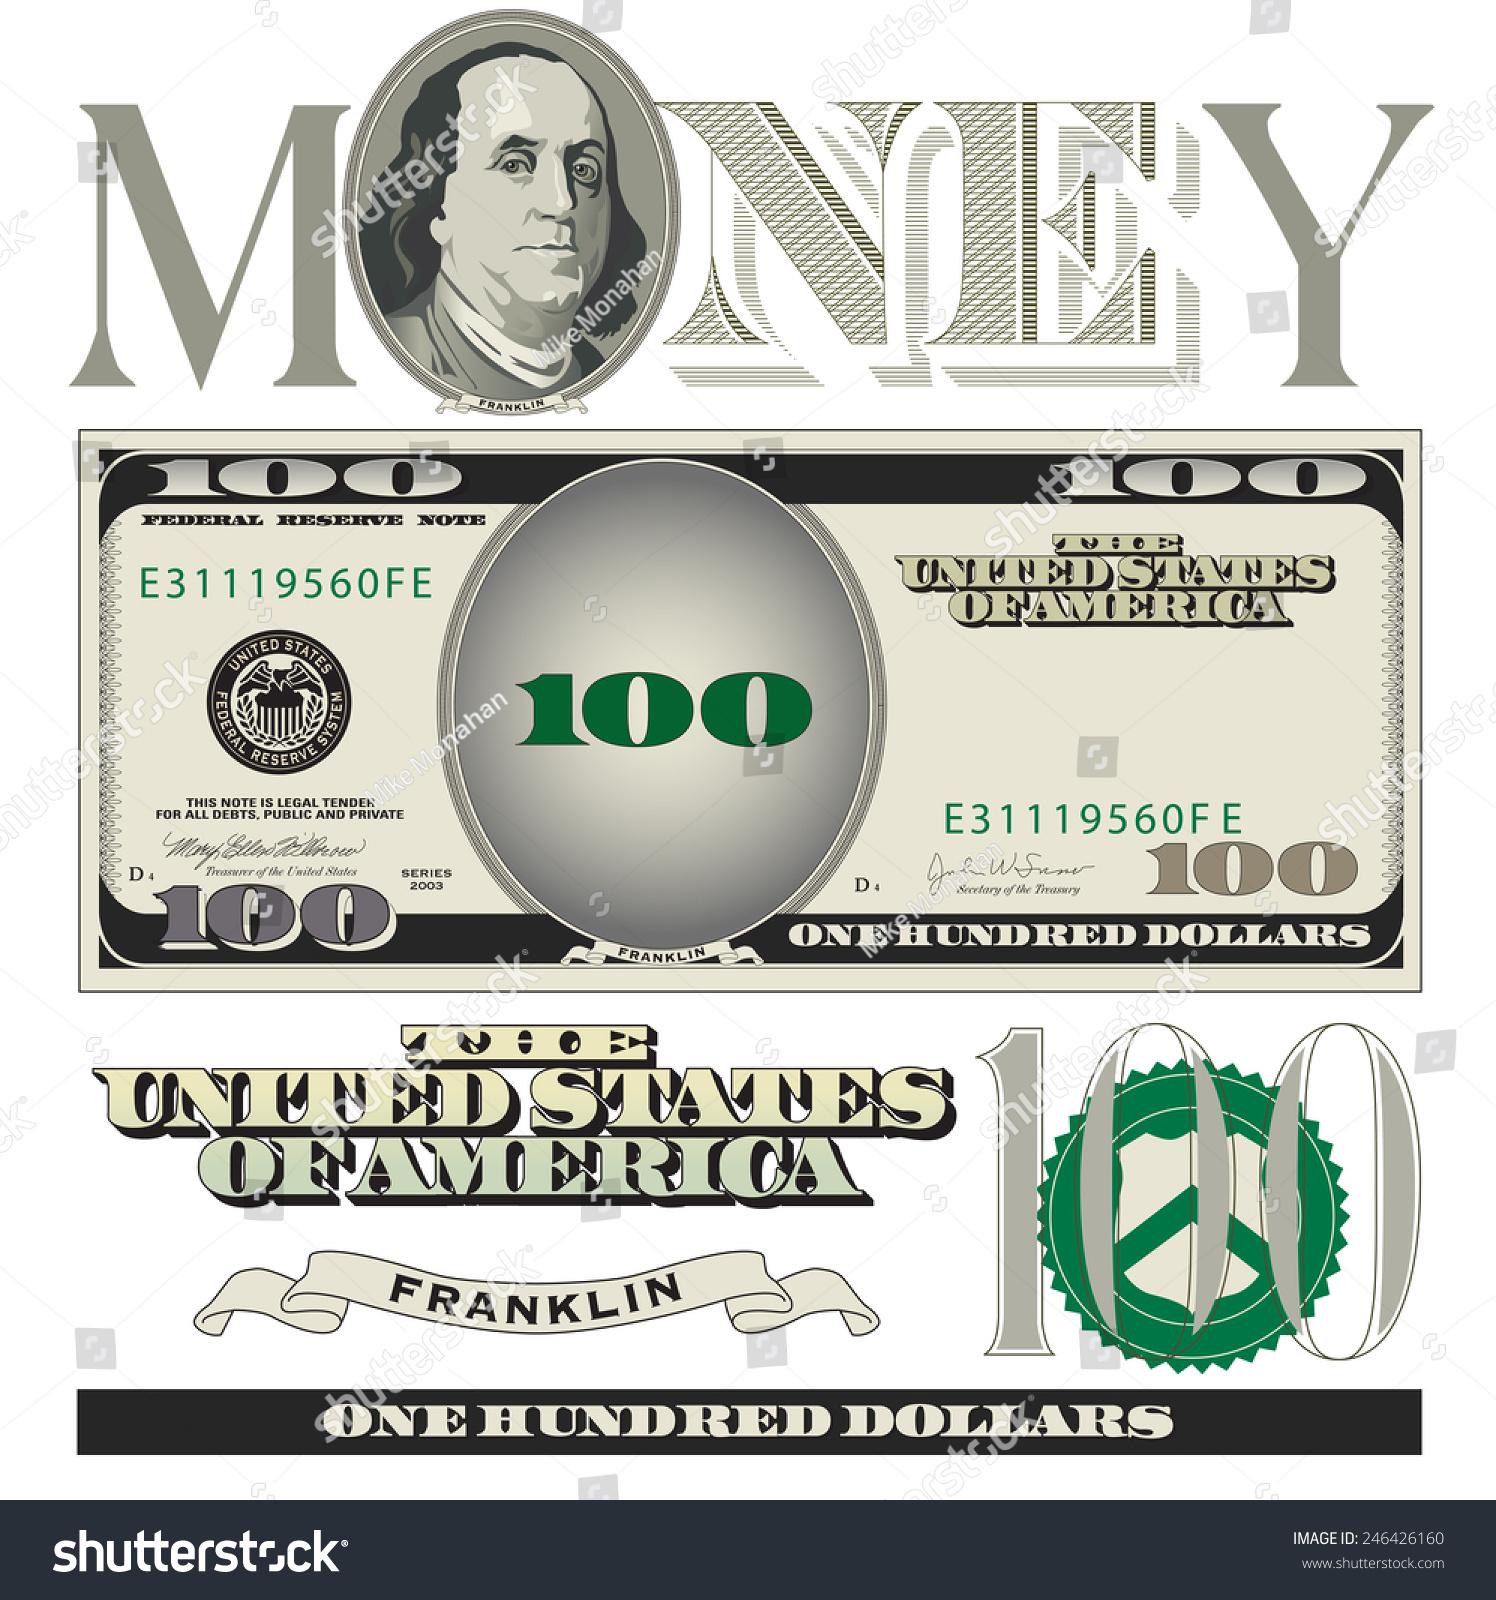 Miscellaneous 100 Dollar Bill Elements Stock Vector HD (Royalty Free ...